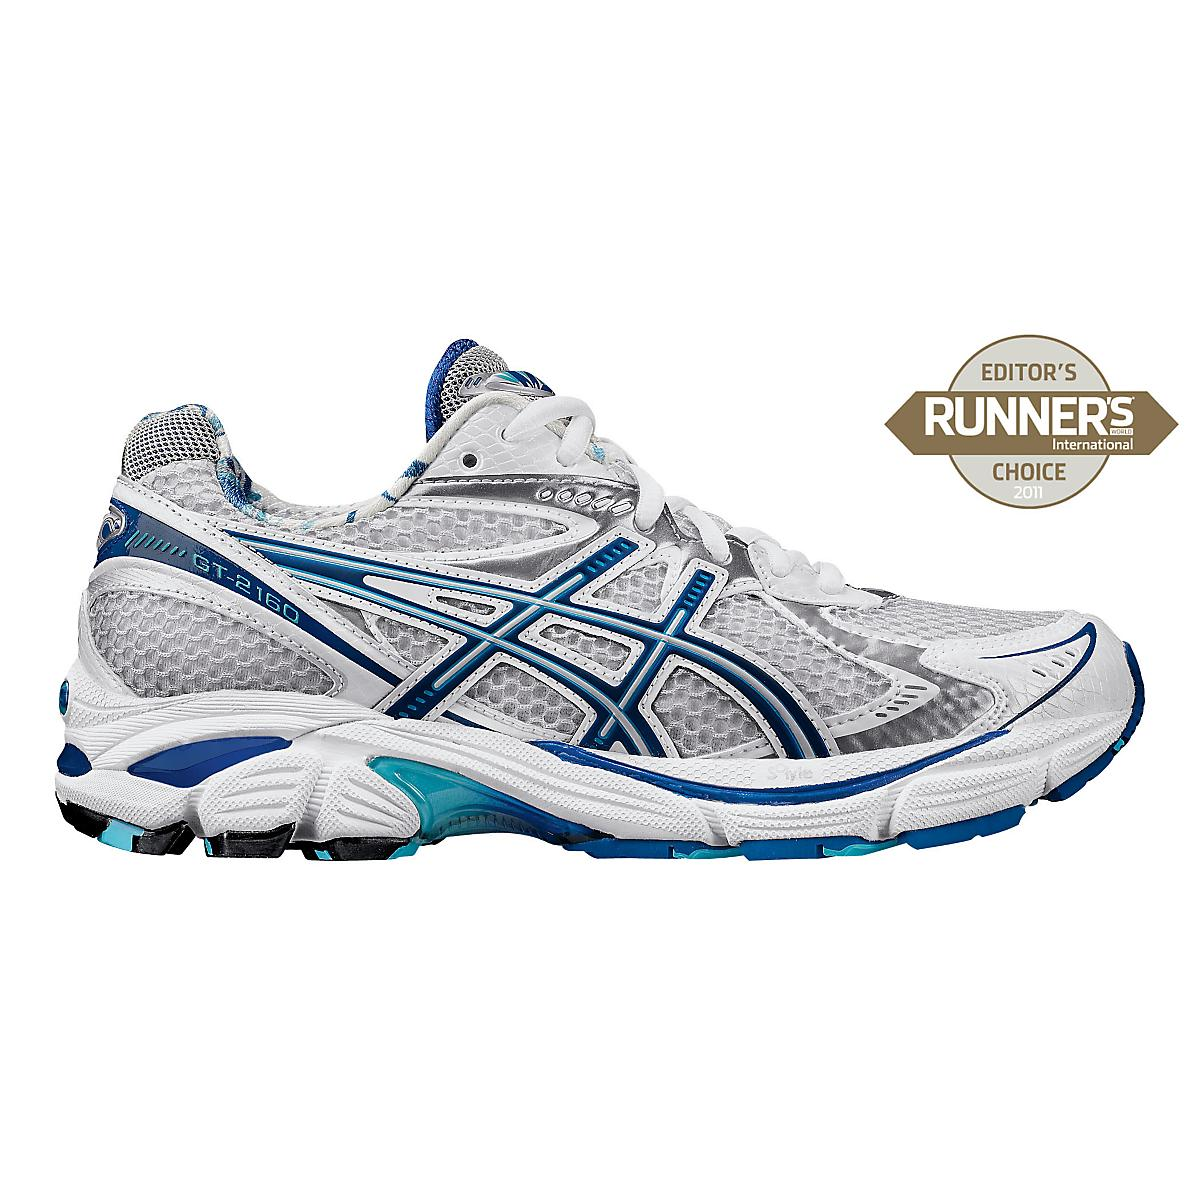 Asics GT 2160 Ladies Running Shoes | Start Fitness